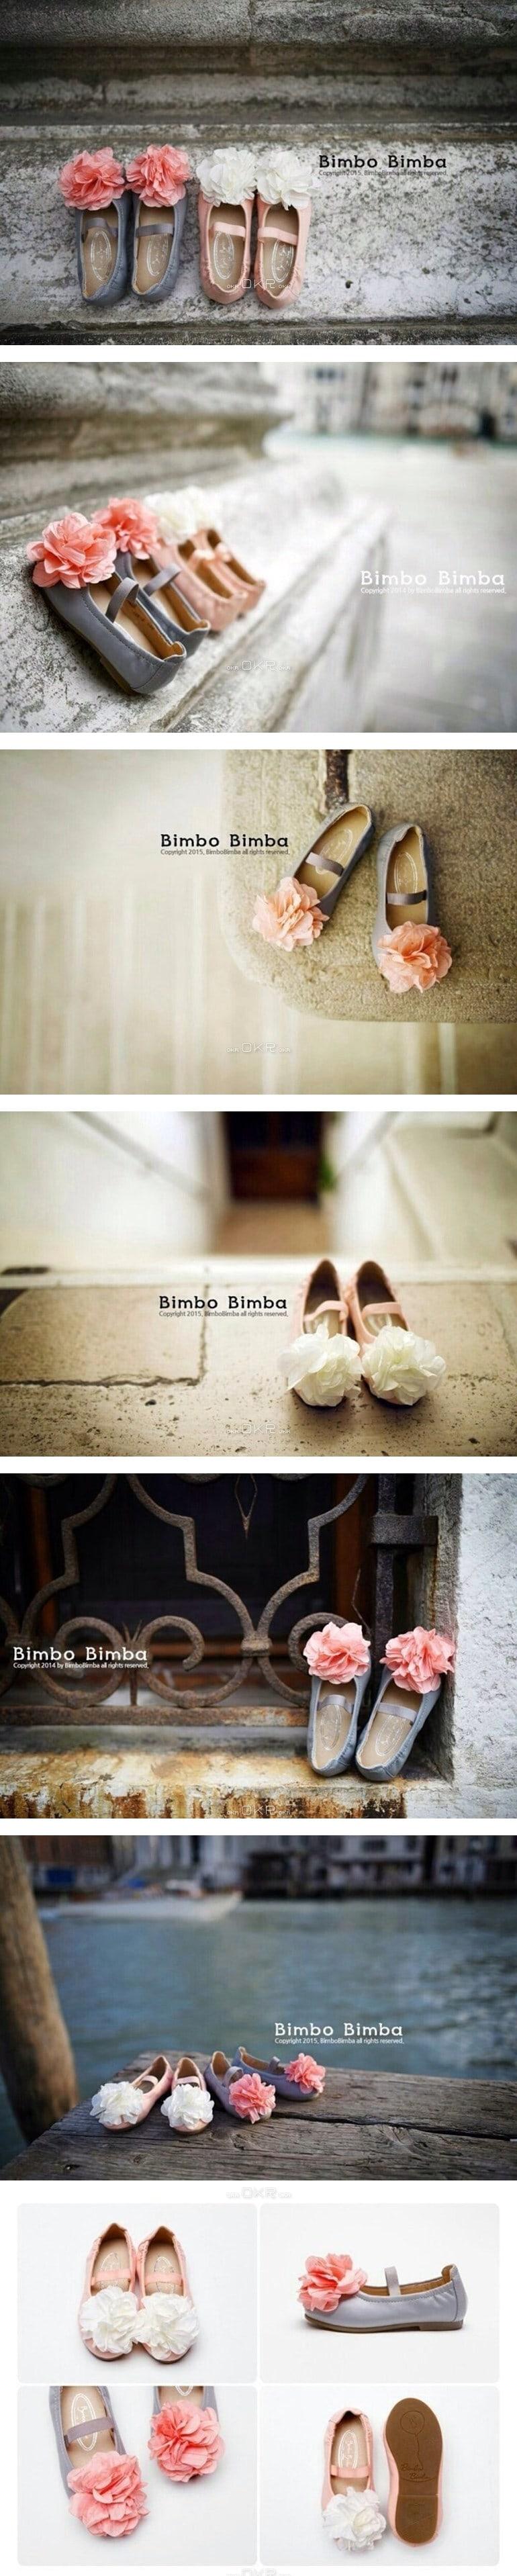 BIMBO BIMBA - Korean Children Fashion - #Kfashion4kids - Flower Flats